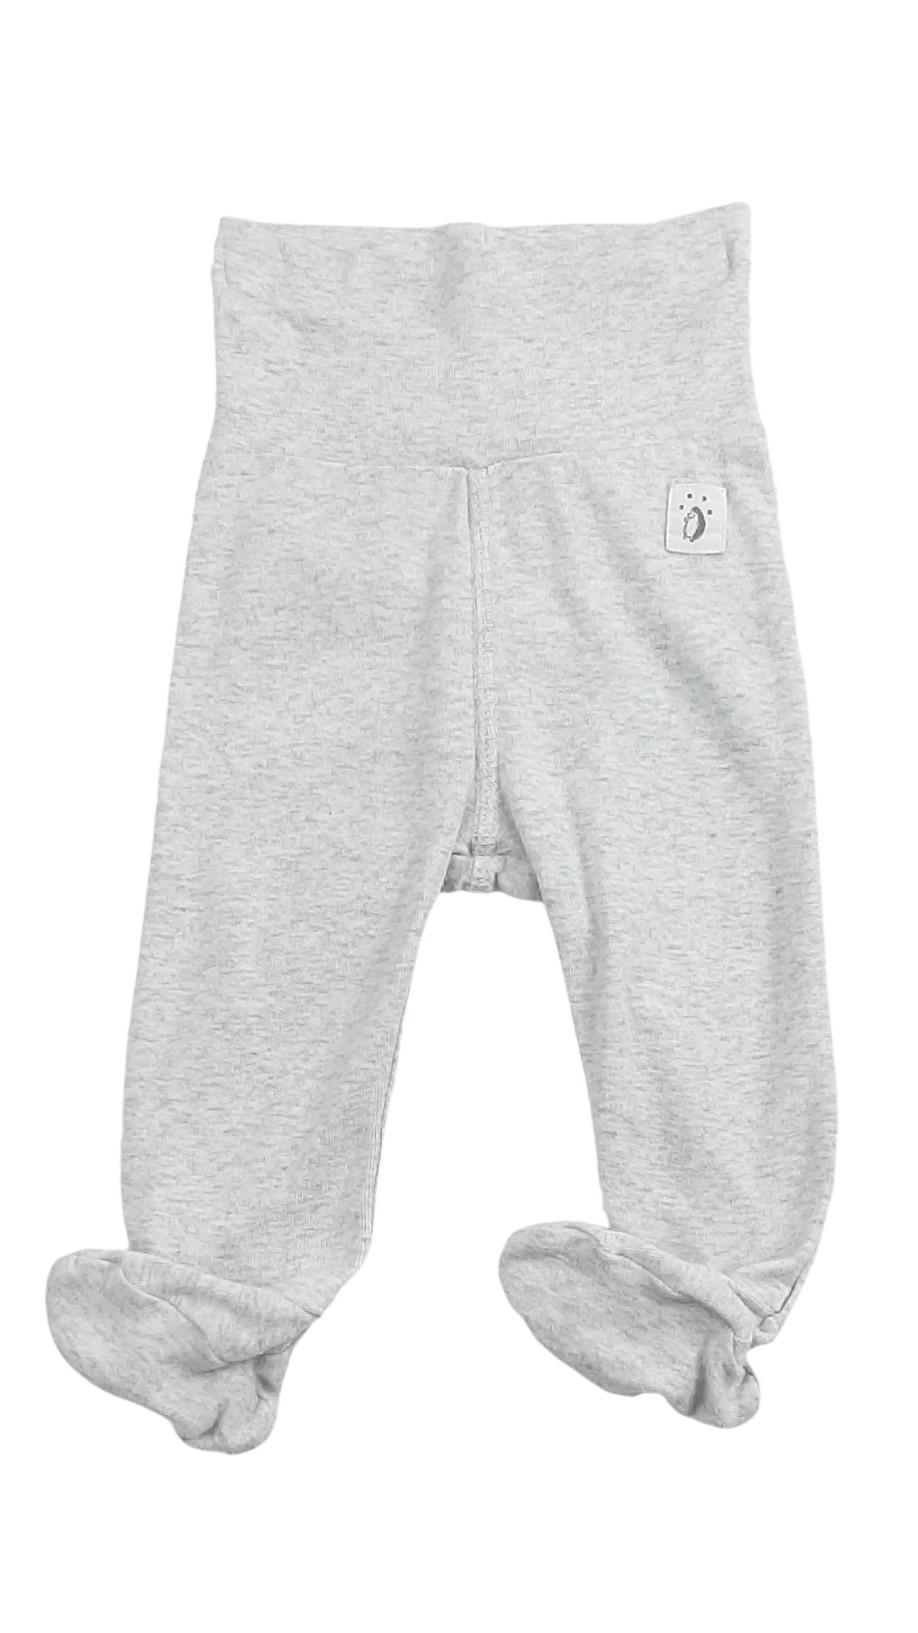 Pantalon style legging avec pieds 1